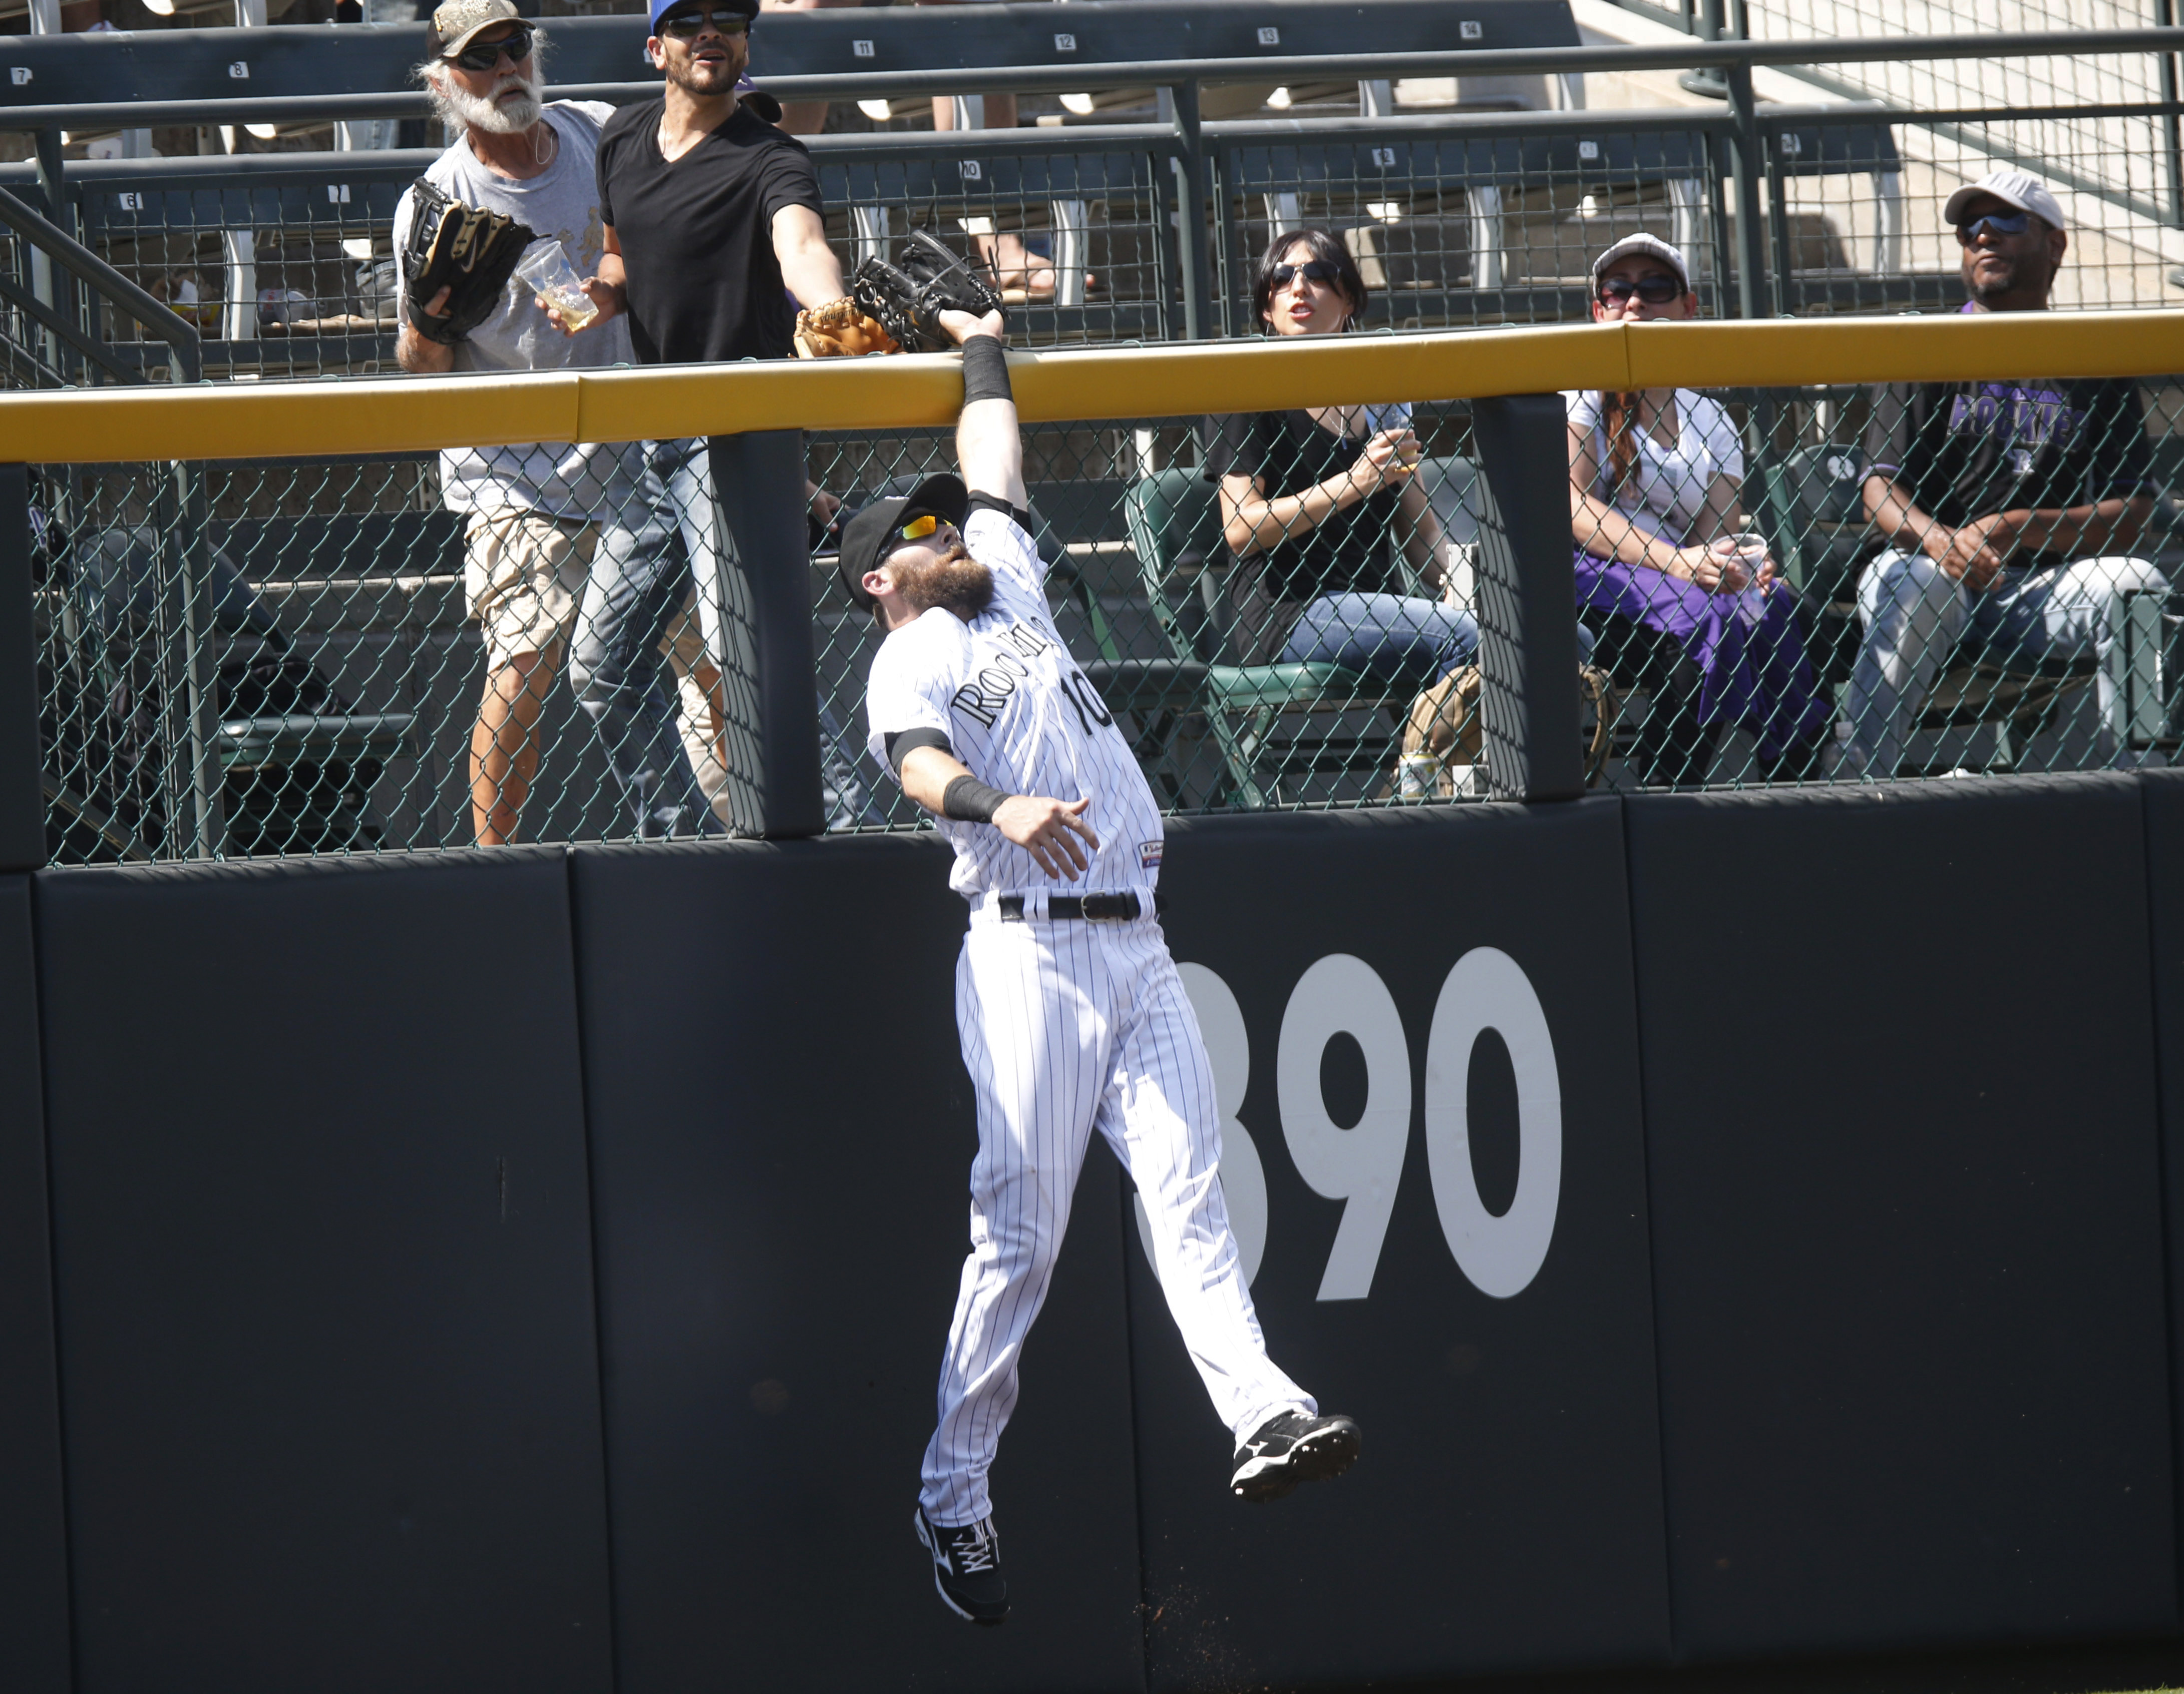 Colorado Rockies left fielder Ben Paulsen pulls in a fly ball hit by Arizona Diamondbacks' Chris Owings during the eighth inning of a baseball game Thursday, June 25, 2015, in Denver. Colorado won 6-4. (AP Photo/David Zalubowski)